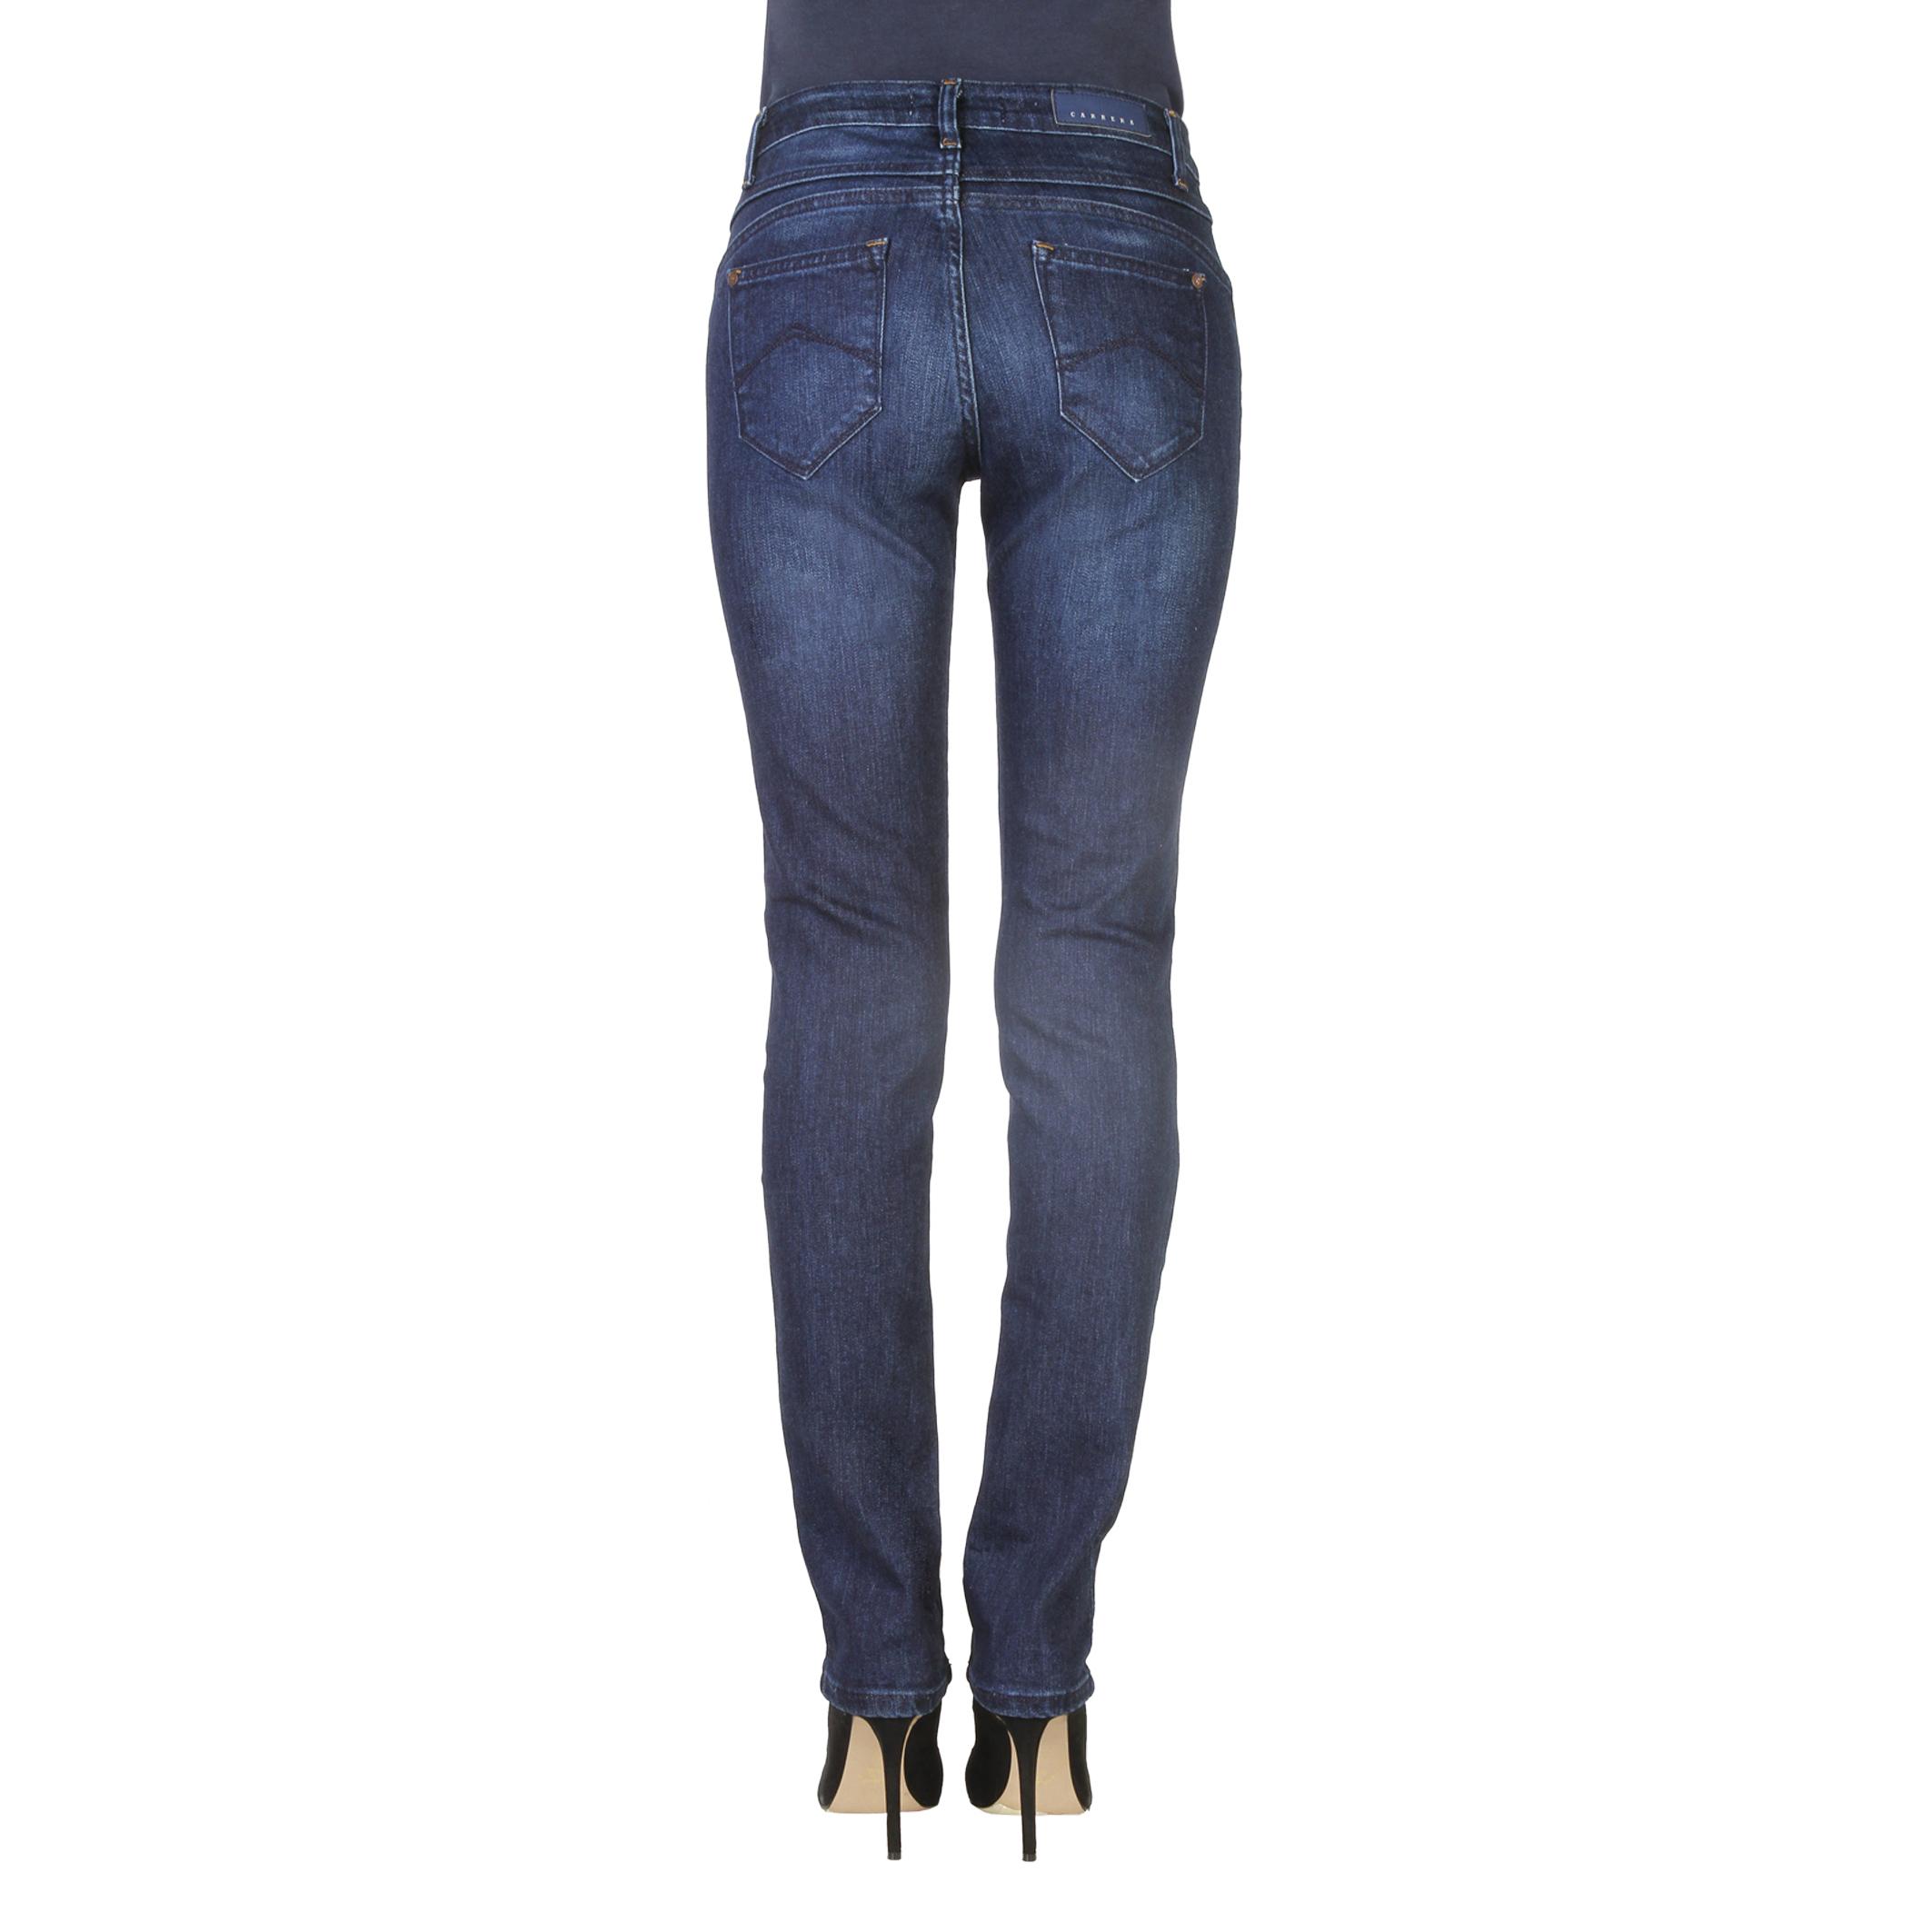 Jeans   Carrera Jeans 00752C_0970A blue